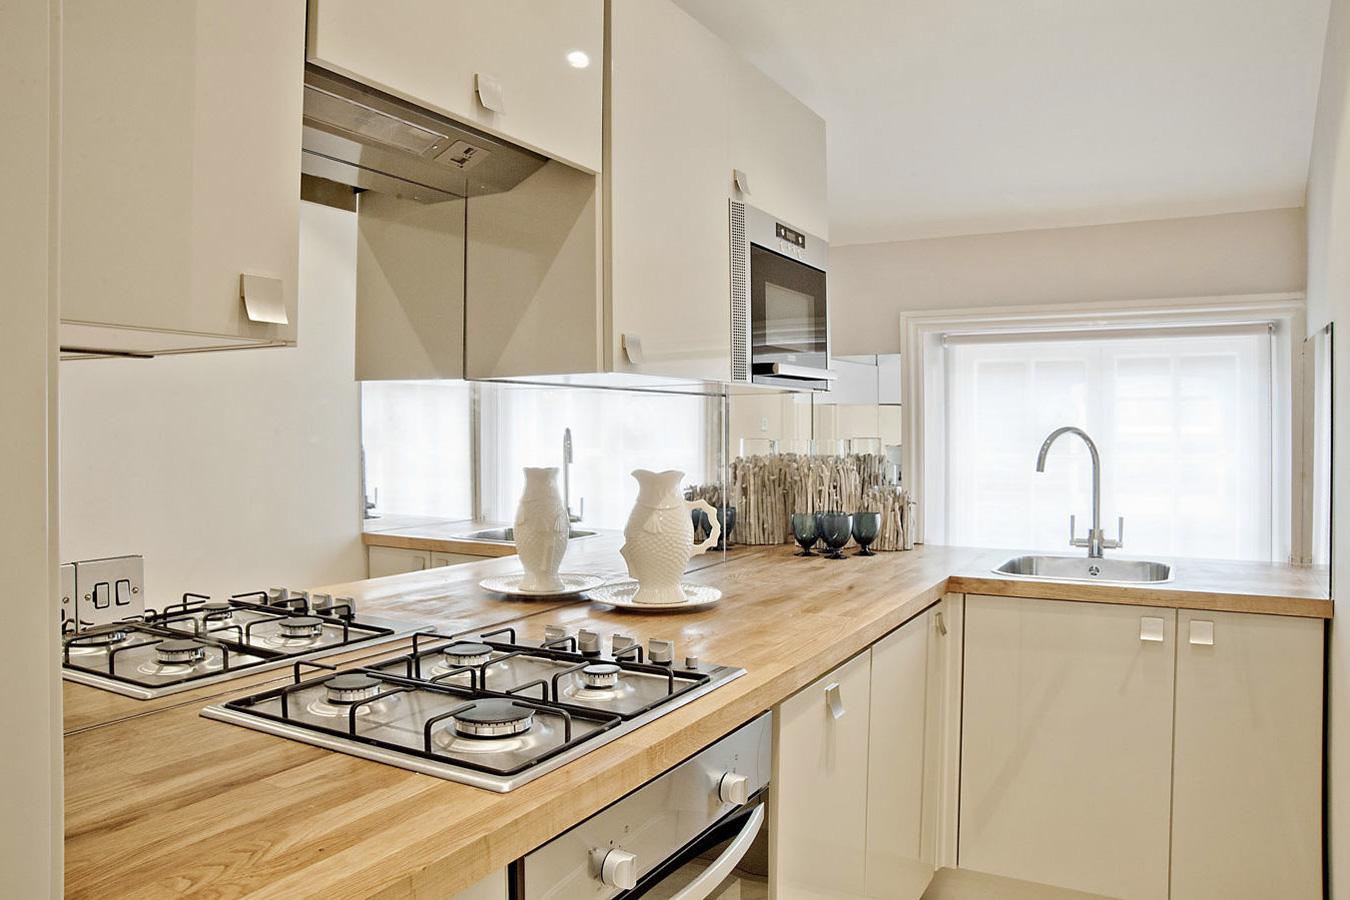 Design Box London - Interior Design - Chelsea Studio, SW3 - Kitchen